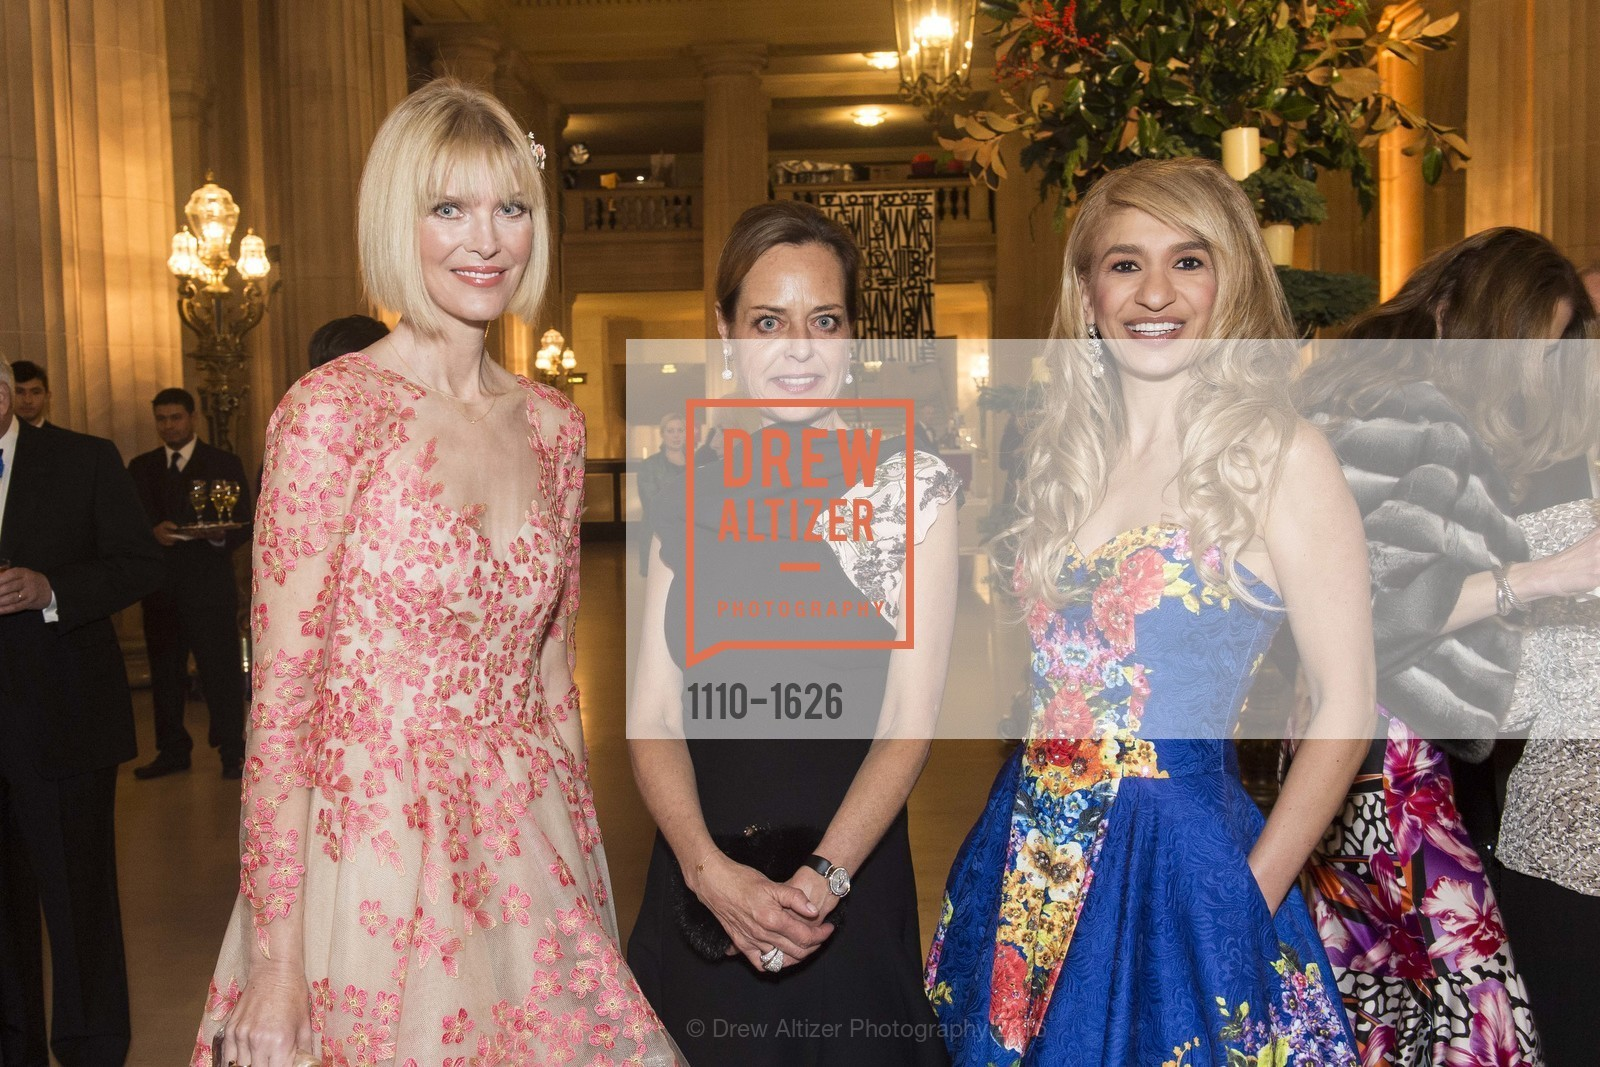 Karen Richardson, Charlot Malin, Navid Armstrong, Photo #1110-1626